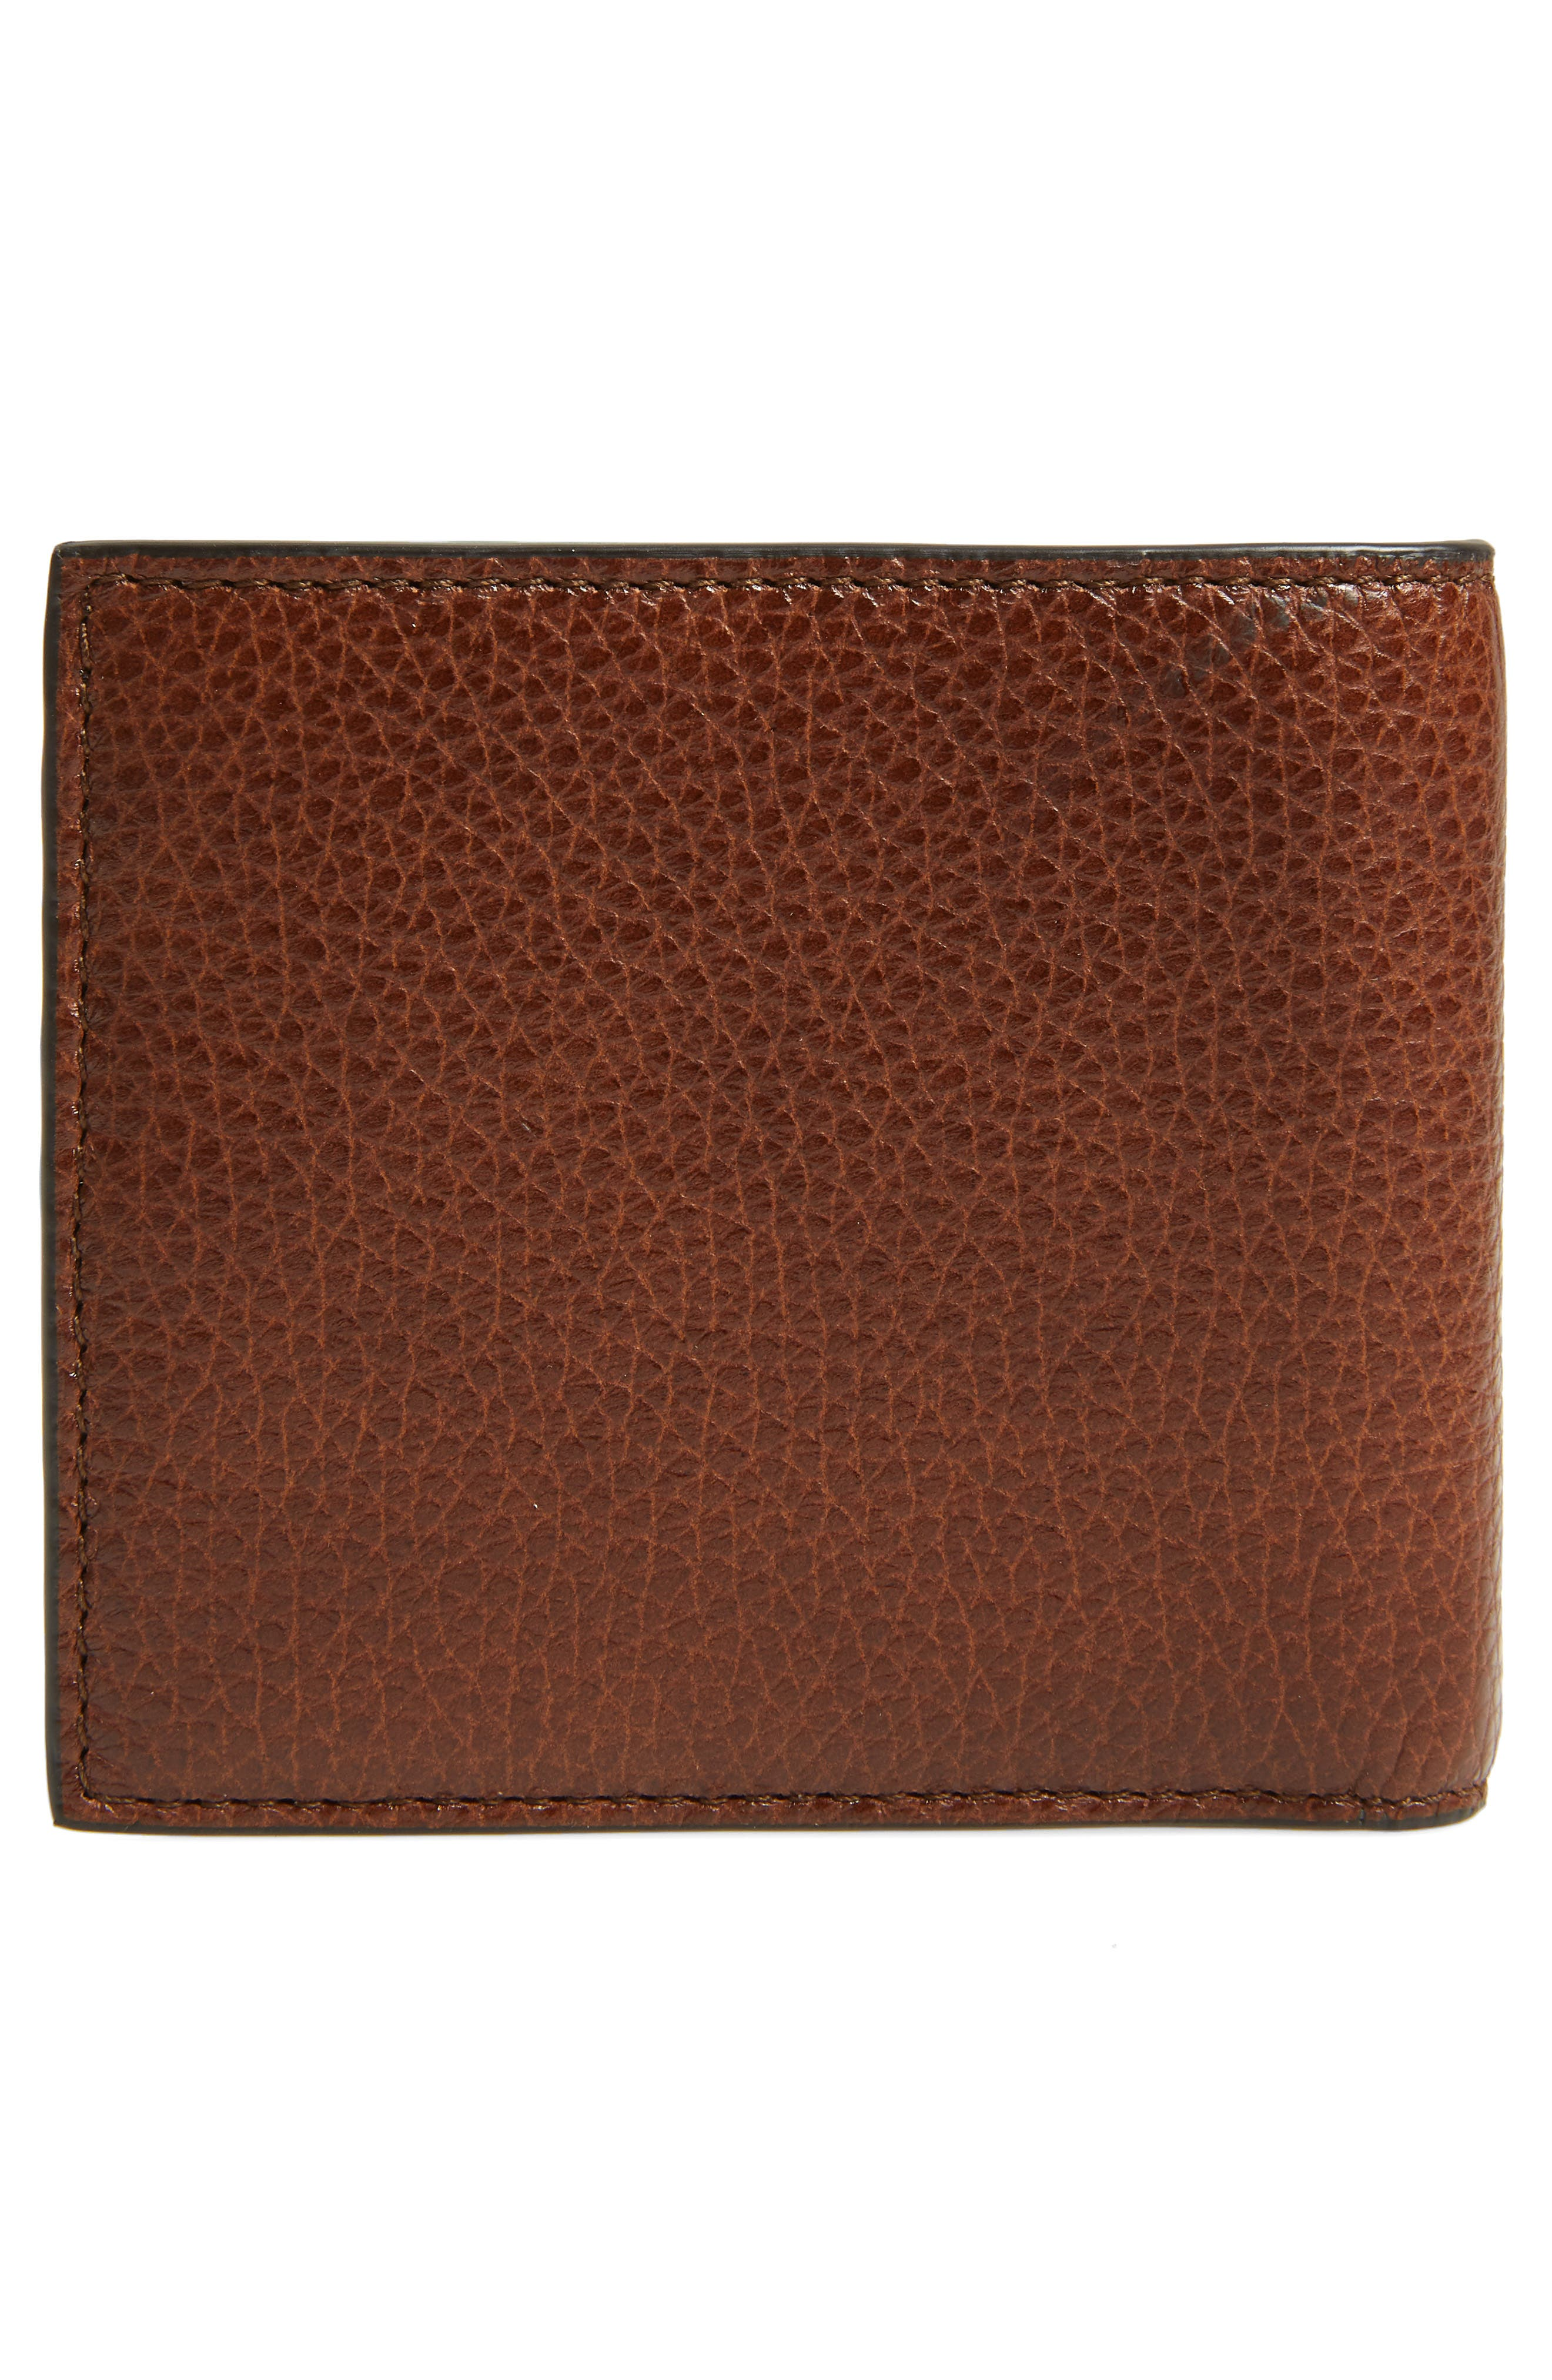 Traveller Leather Wallet,                             Alternate thumbnail 3, color,                             MEDIUM BROWN